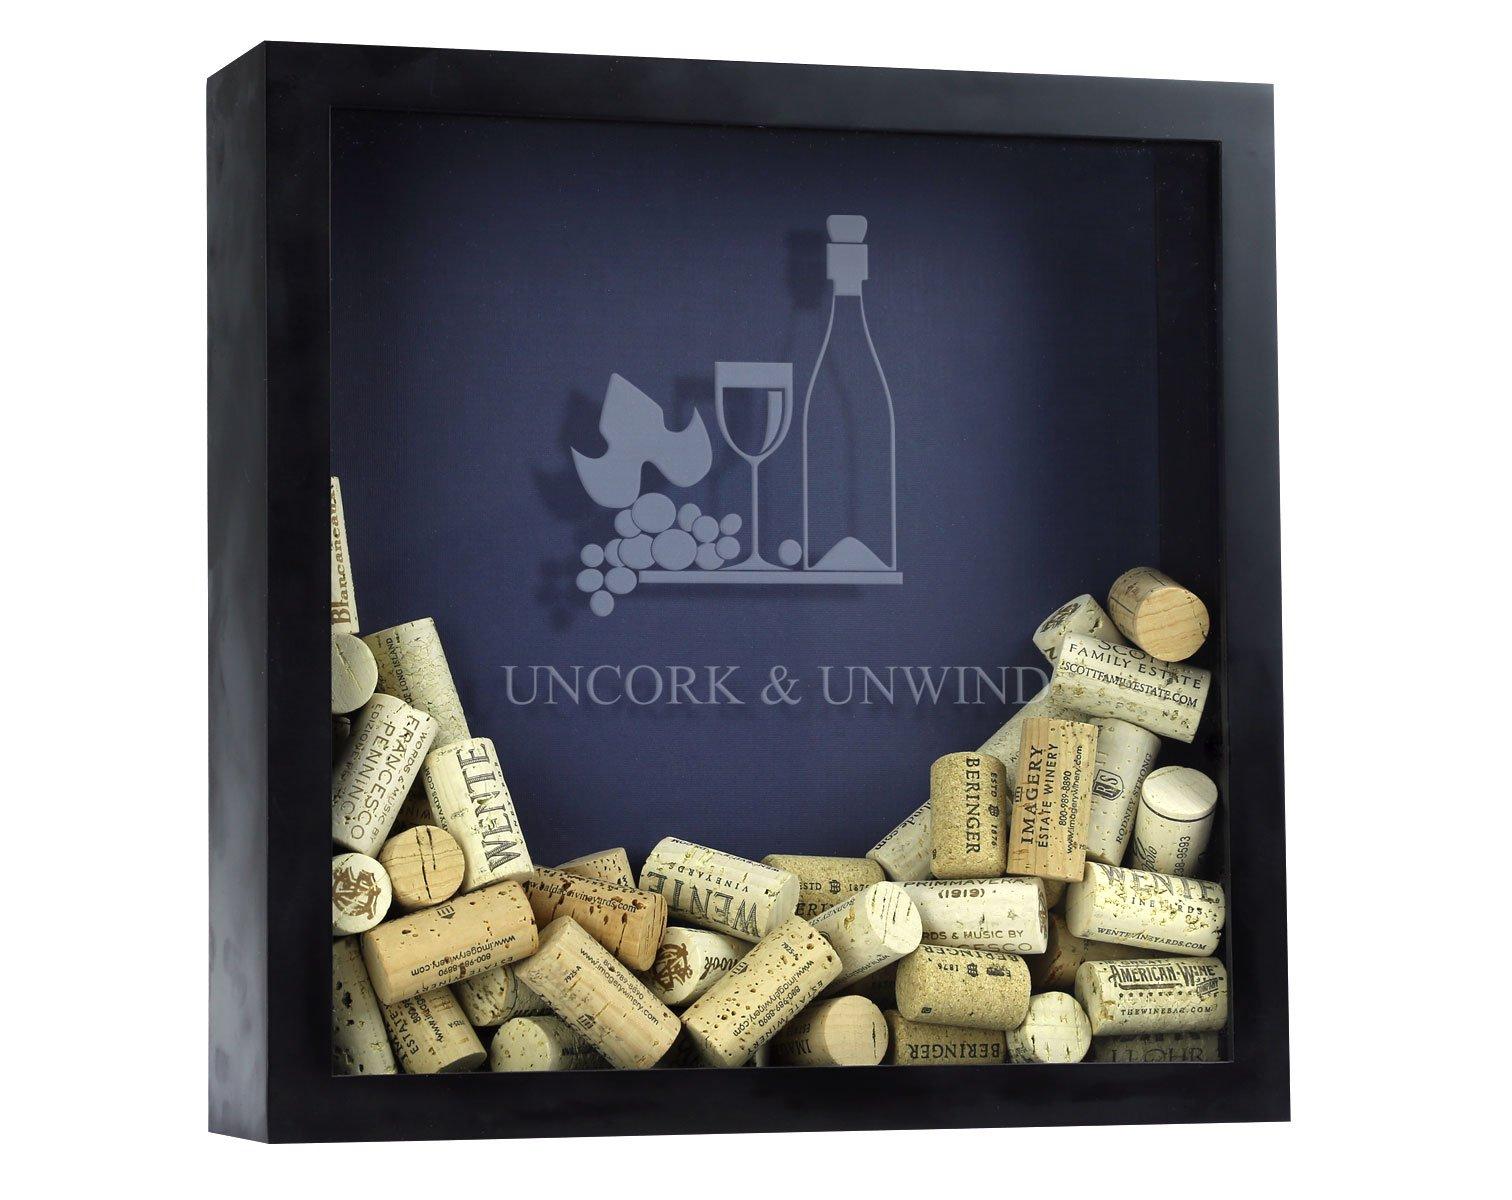 Wine Cork Shadow Box, Wine Cork Box, Wine Cork Storage, Uncork and Unwind by Unknown